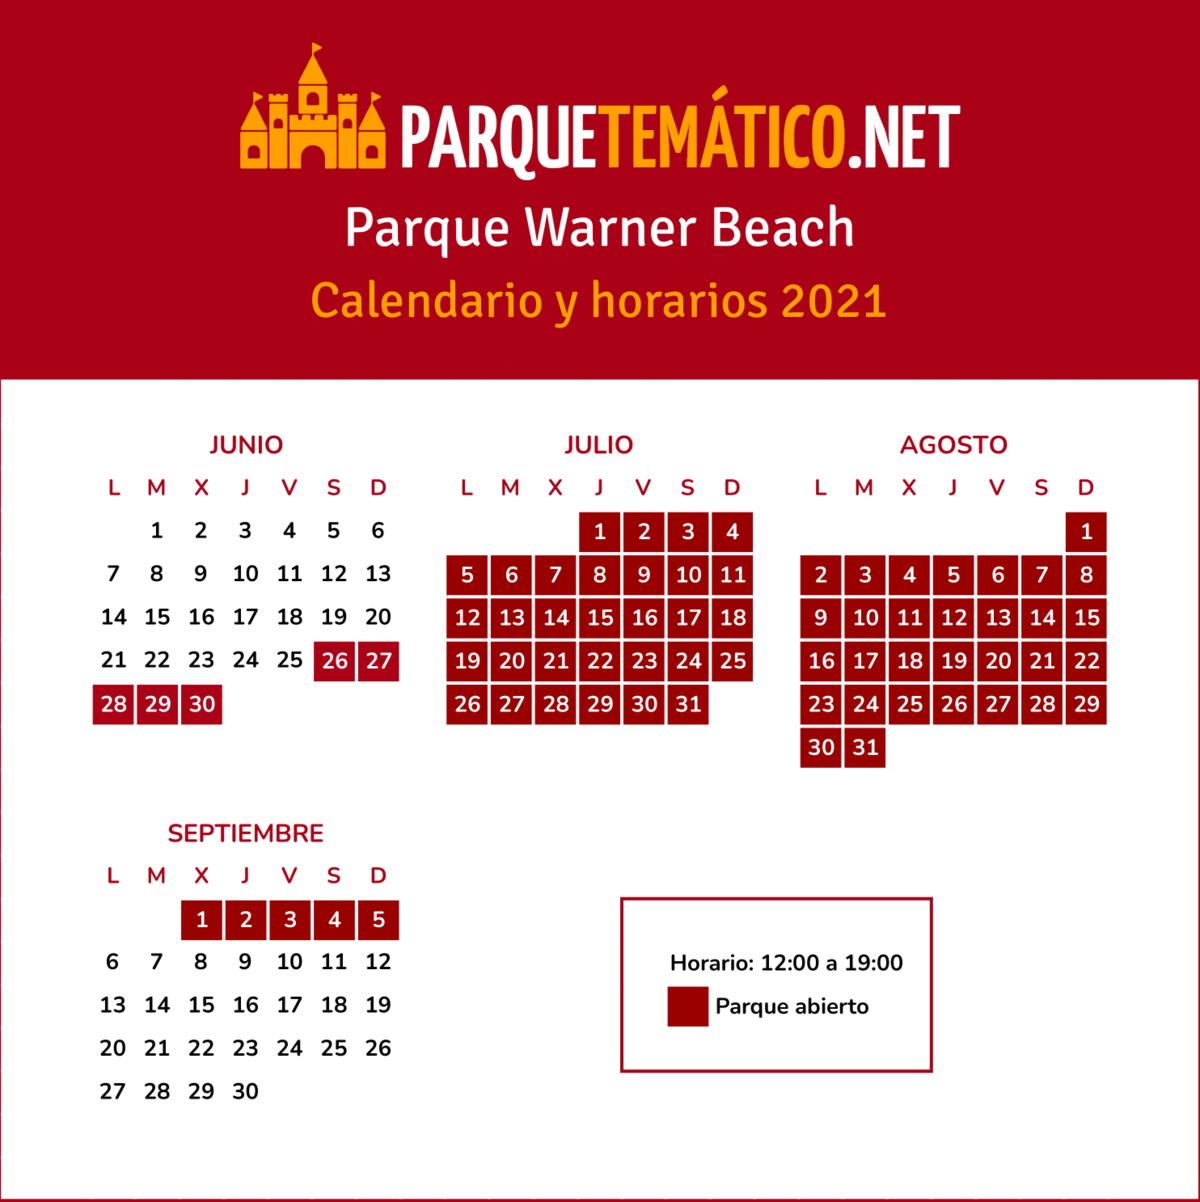 Calendario Parque Warner Beach 2021 v3